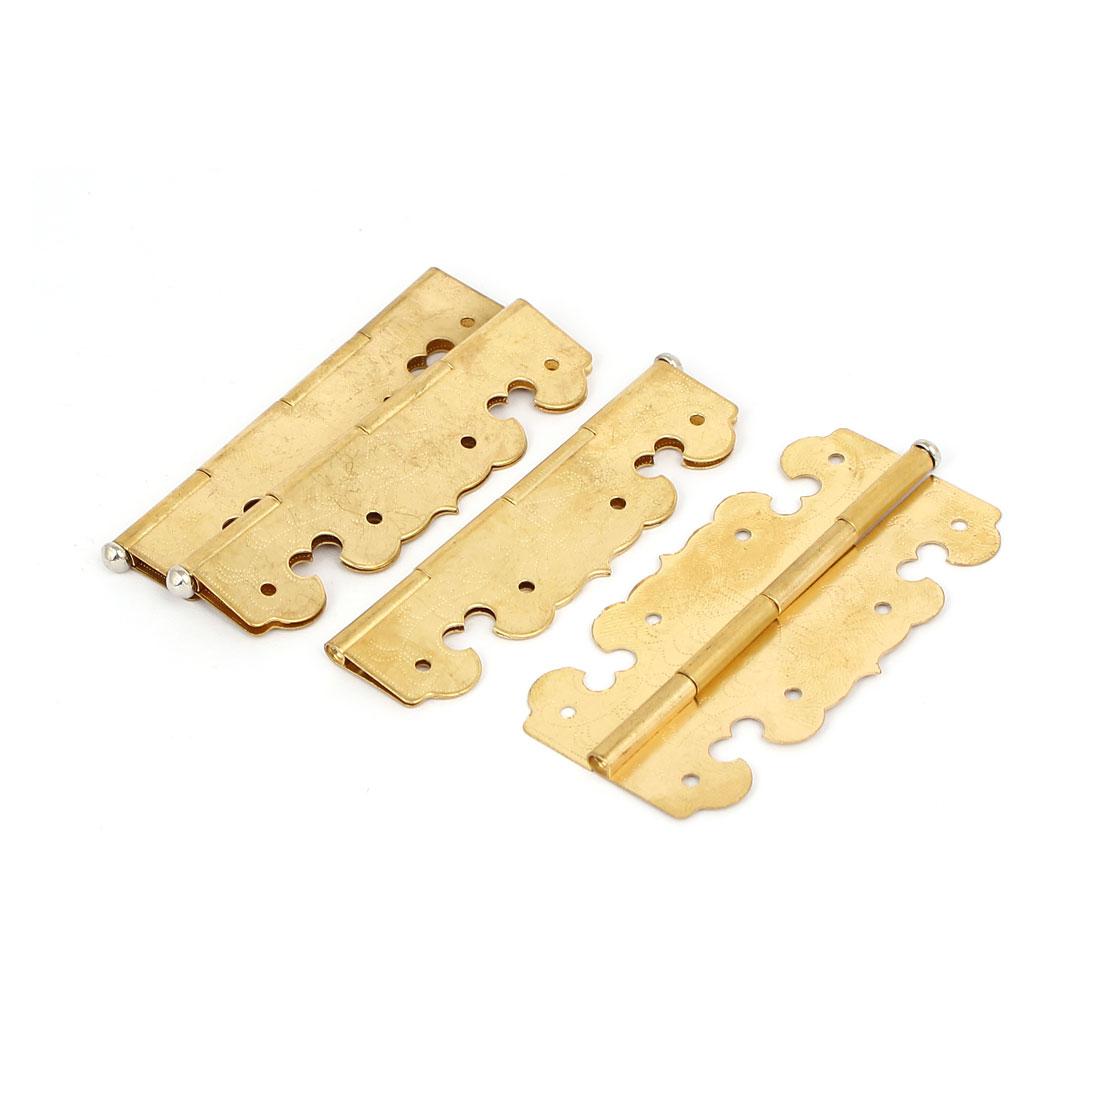 "Closet Cabinet Door Metal Rotatable Butt Hinges Gold Tone 2.7"" Length 4PCS"